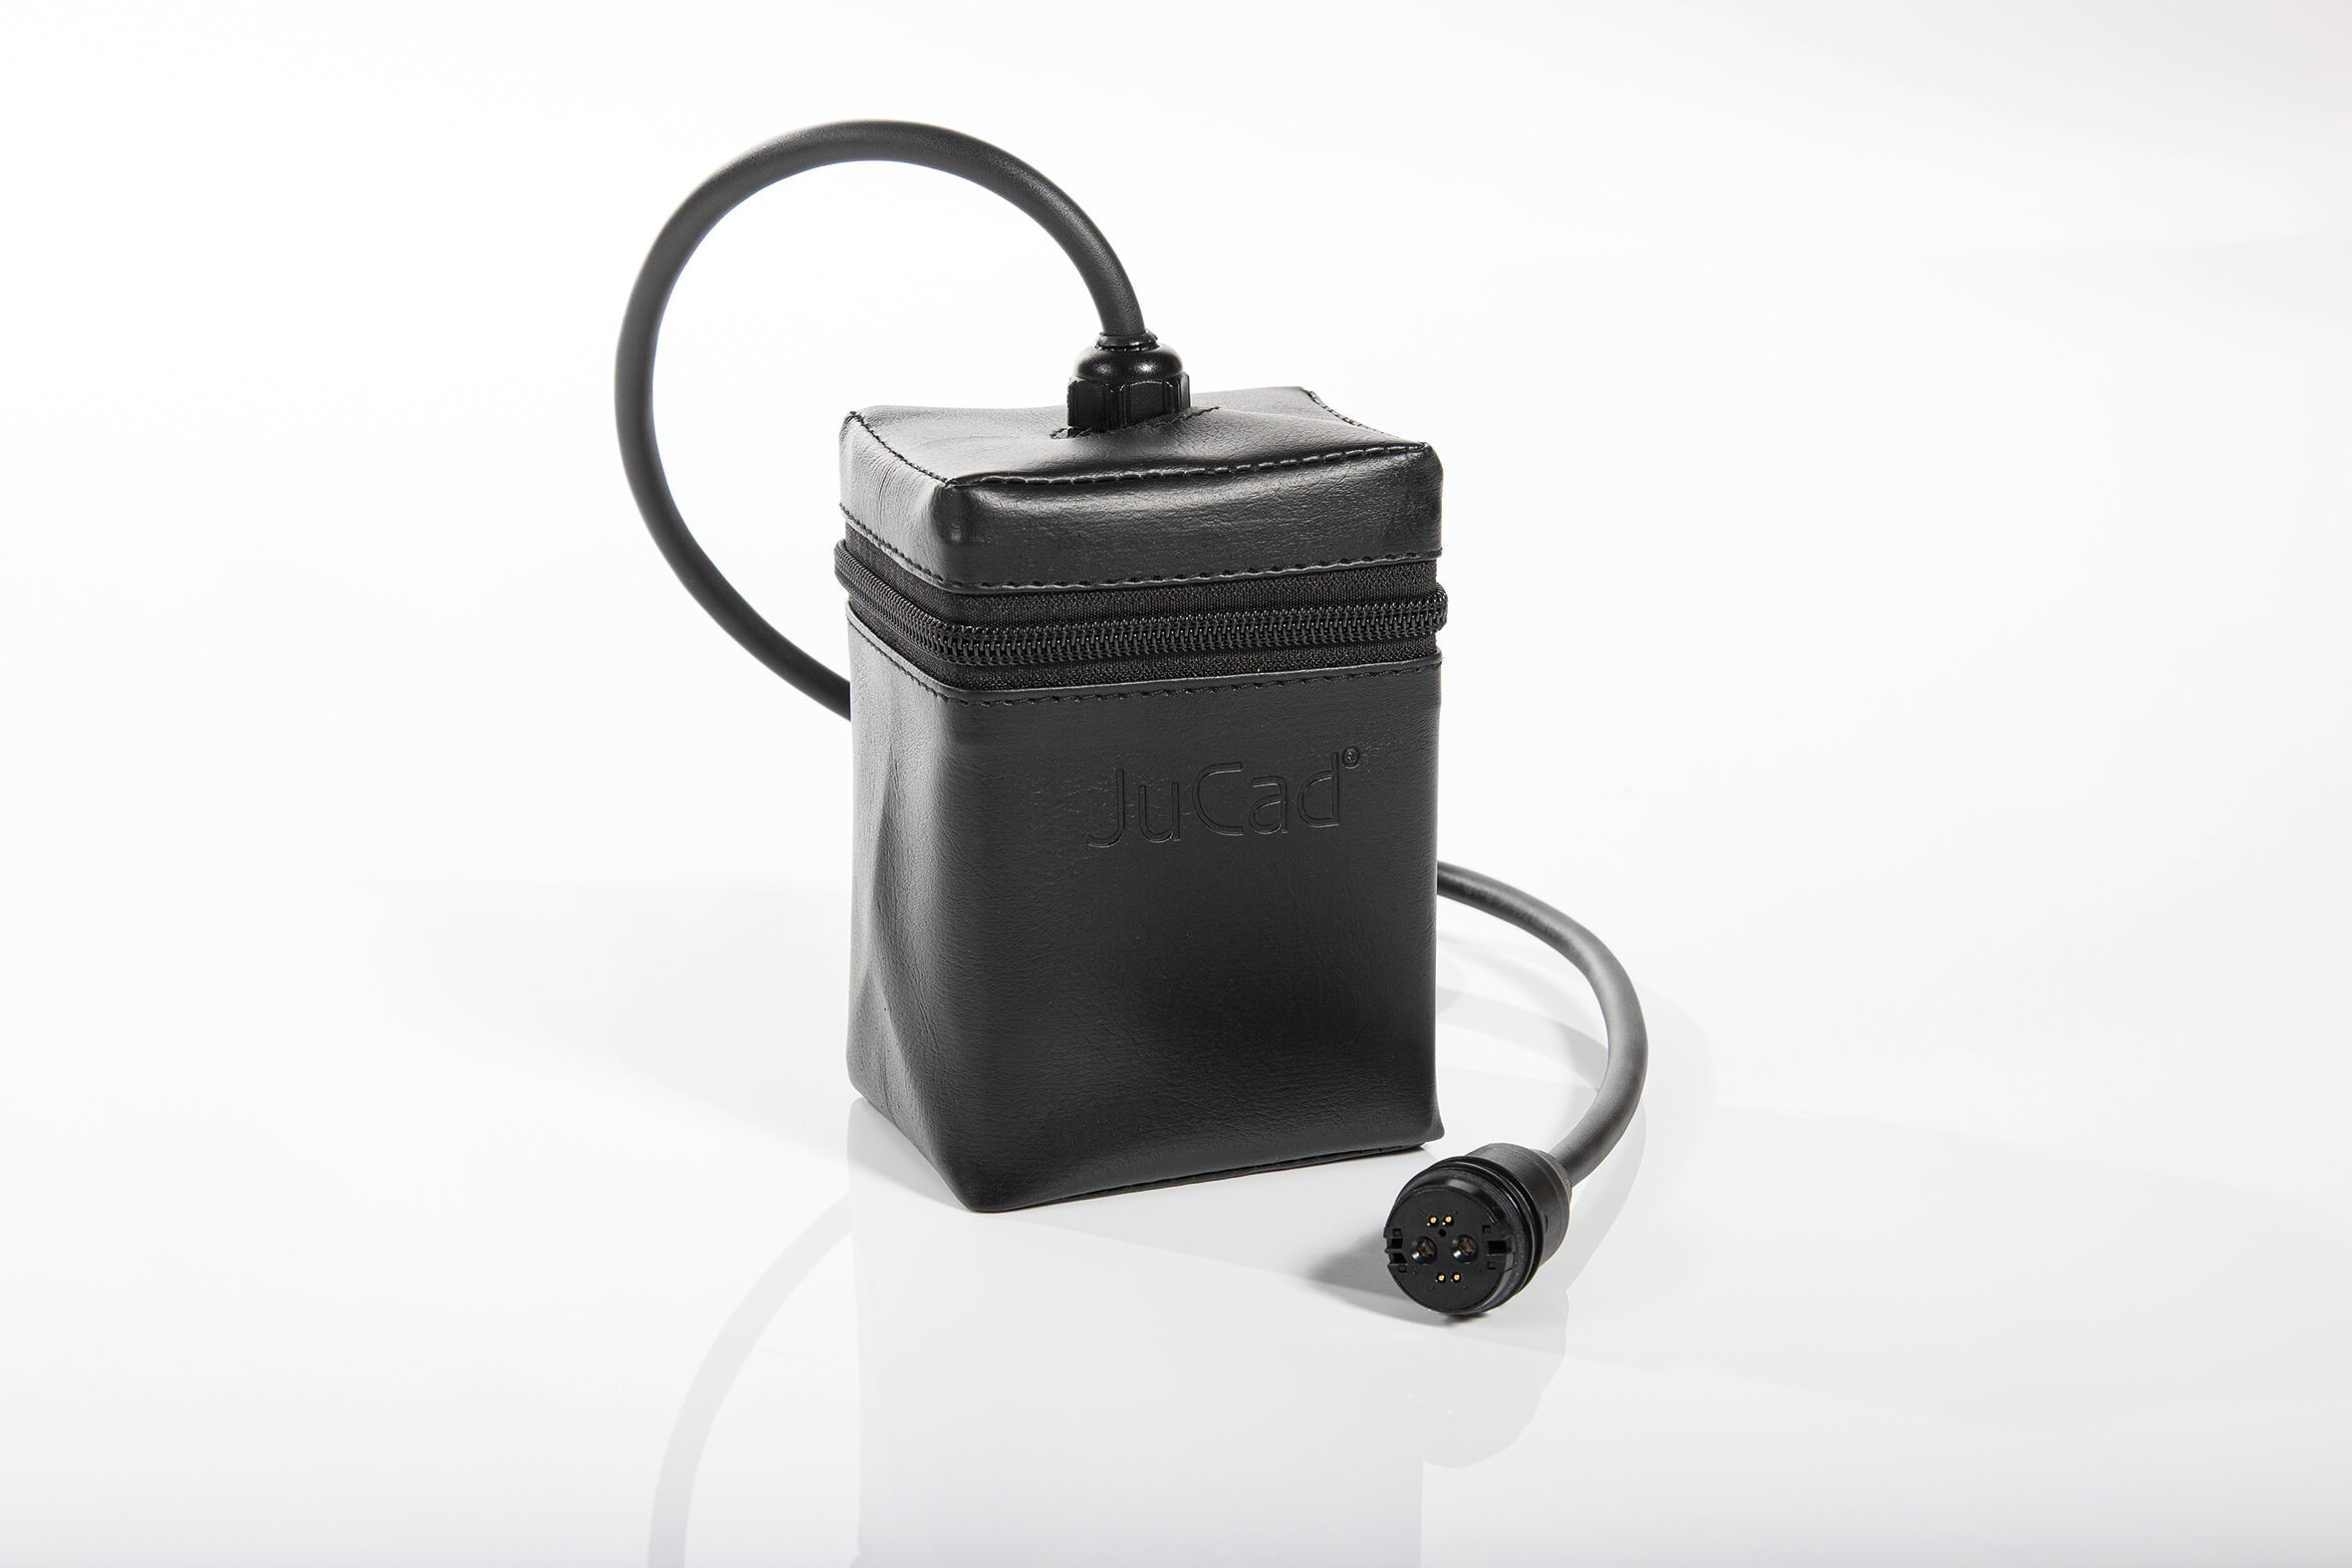 Fernbedienung+Powerpack mit Remote Control